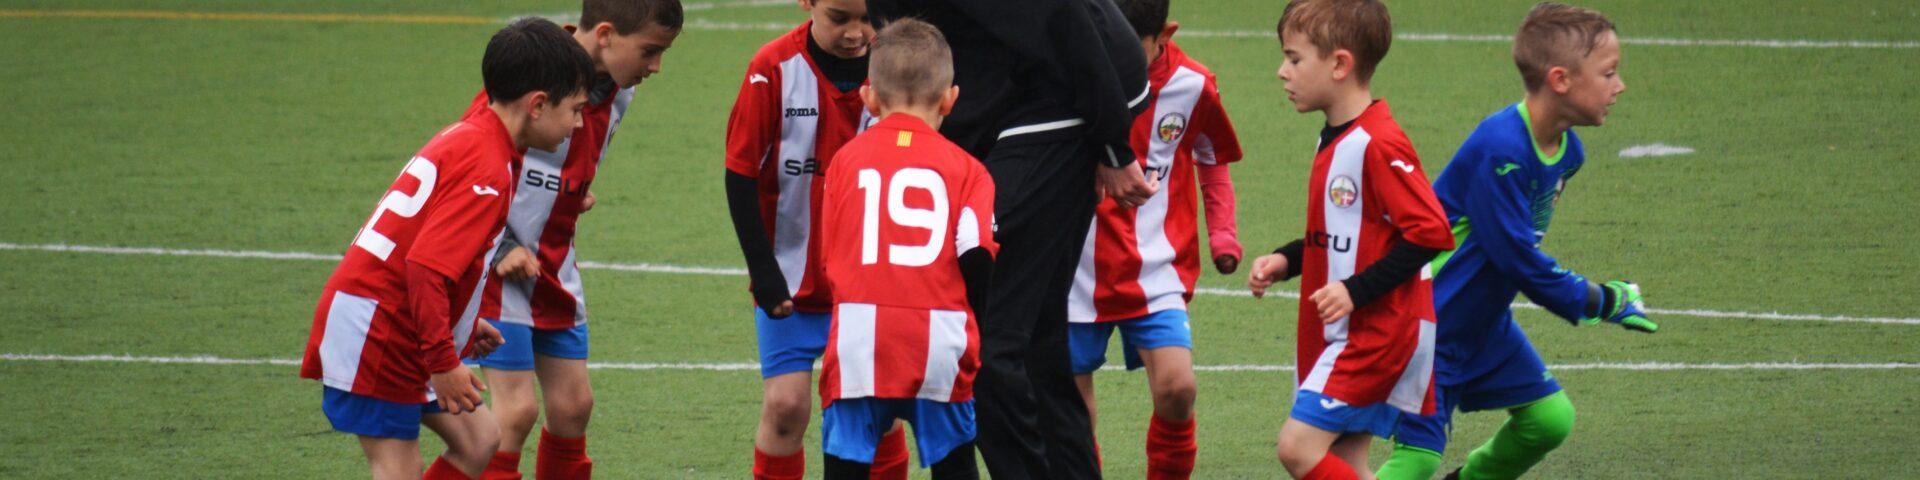 coaching football team